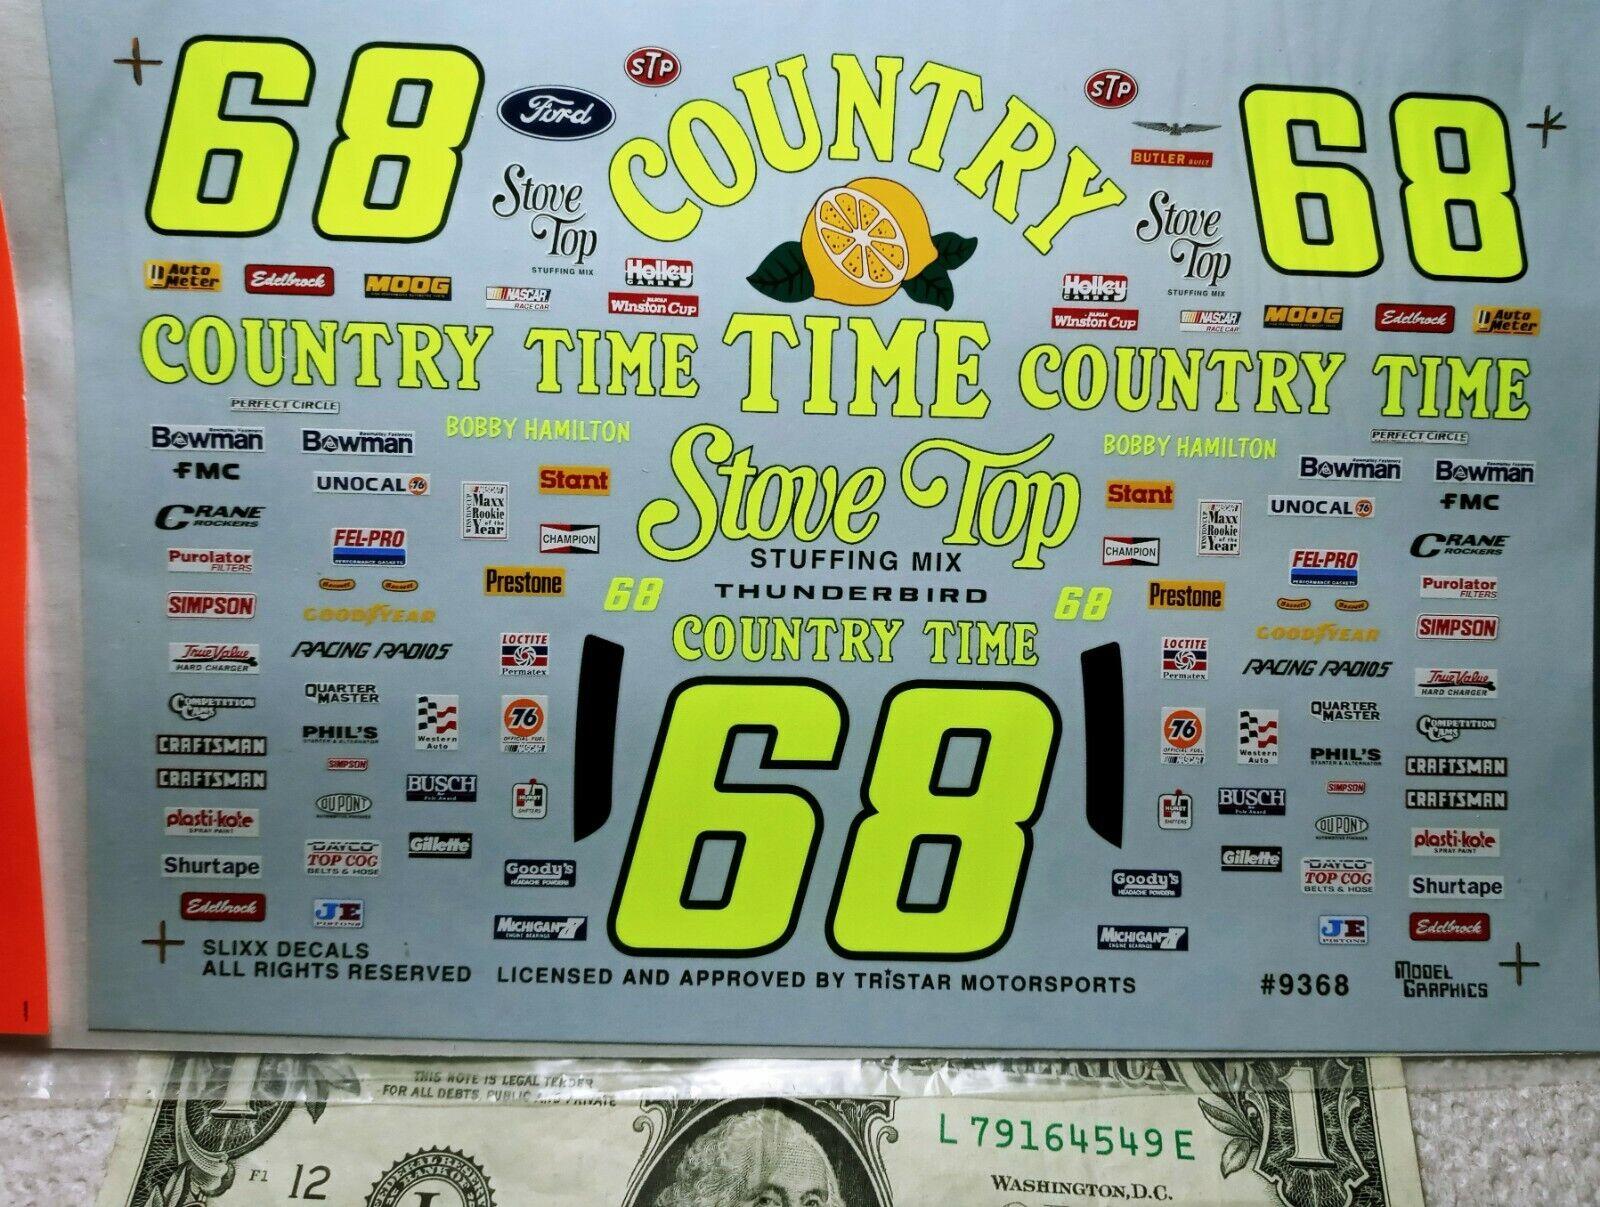 SLIXX WATERSLIDE DECALS 1/24 1:24 Scale Vintage NASCAR #68 Country Time Lemonade